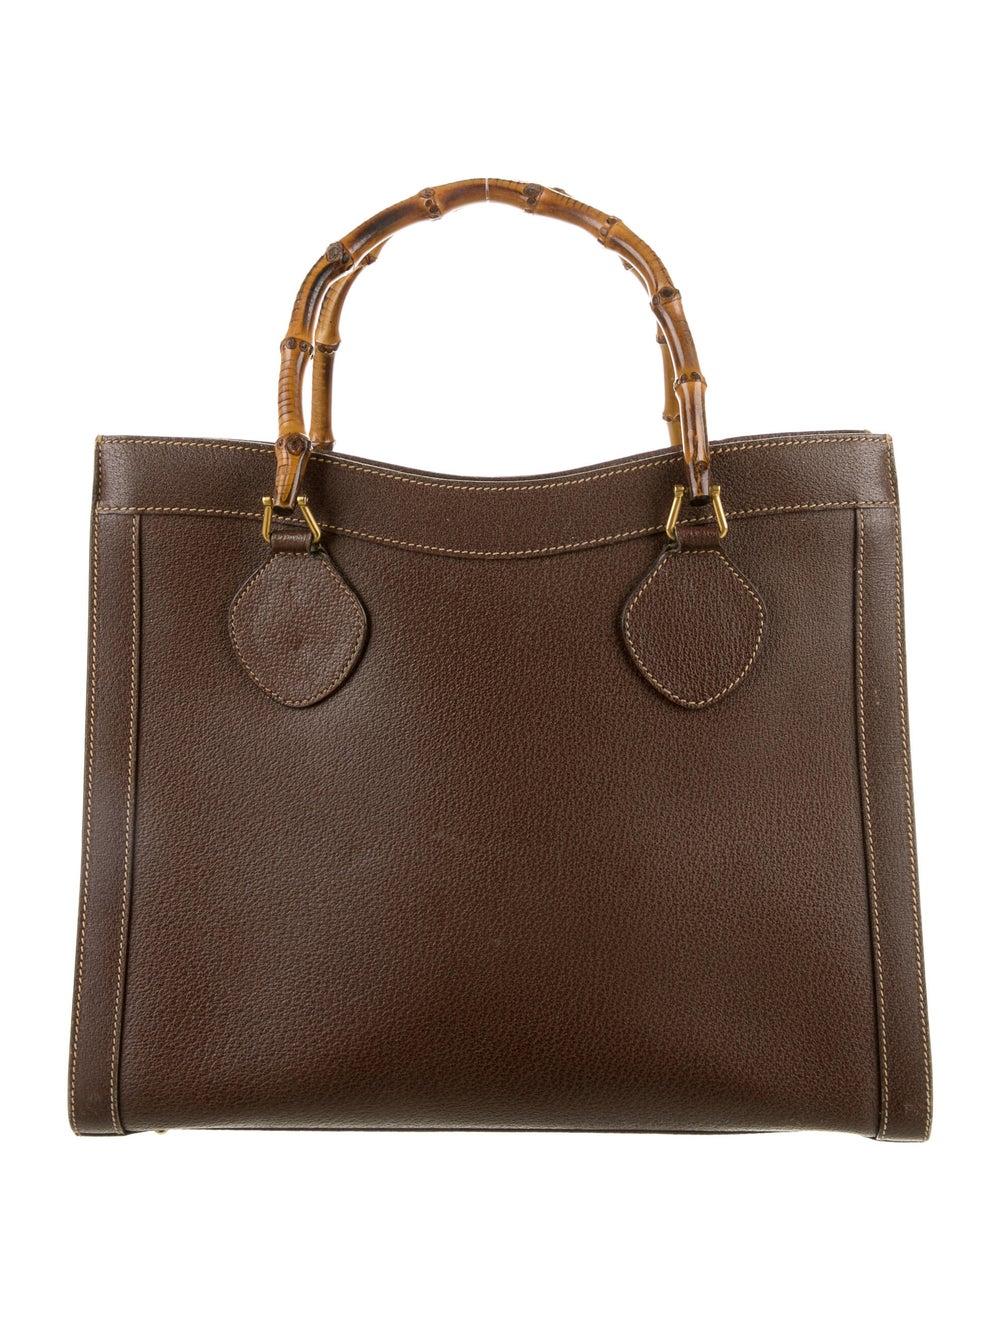 Gucci Vintage Diana Bamboo Tote Brown - image 1